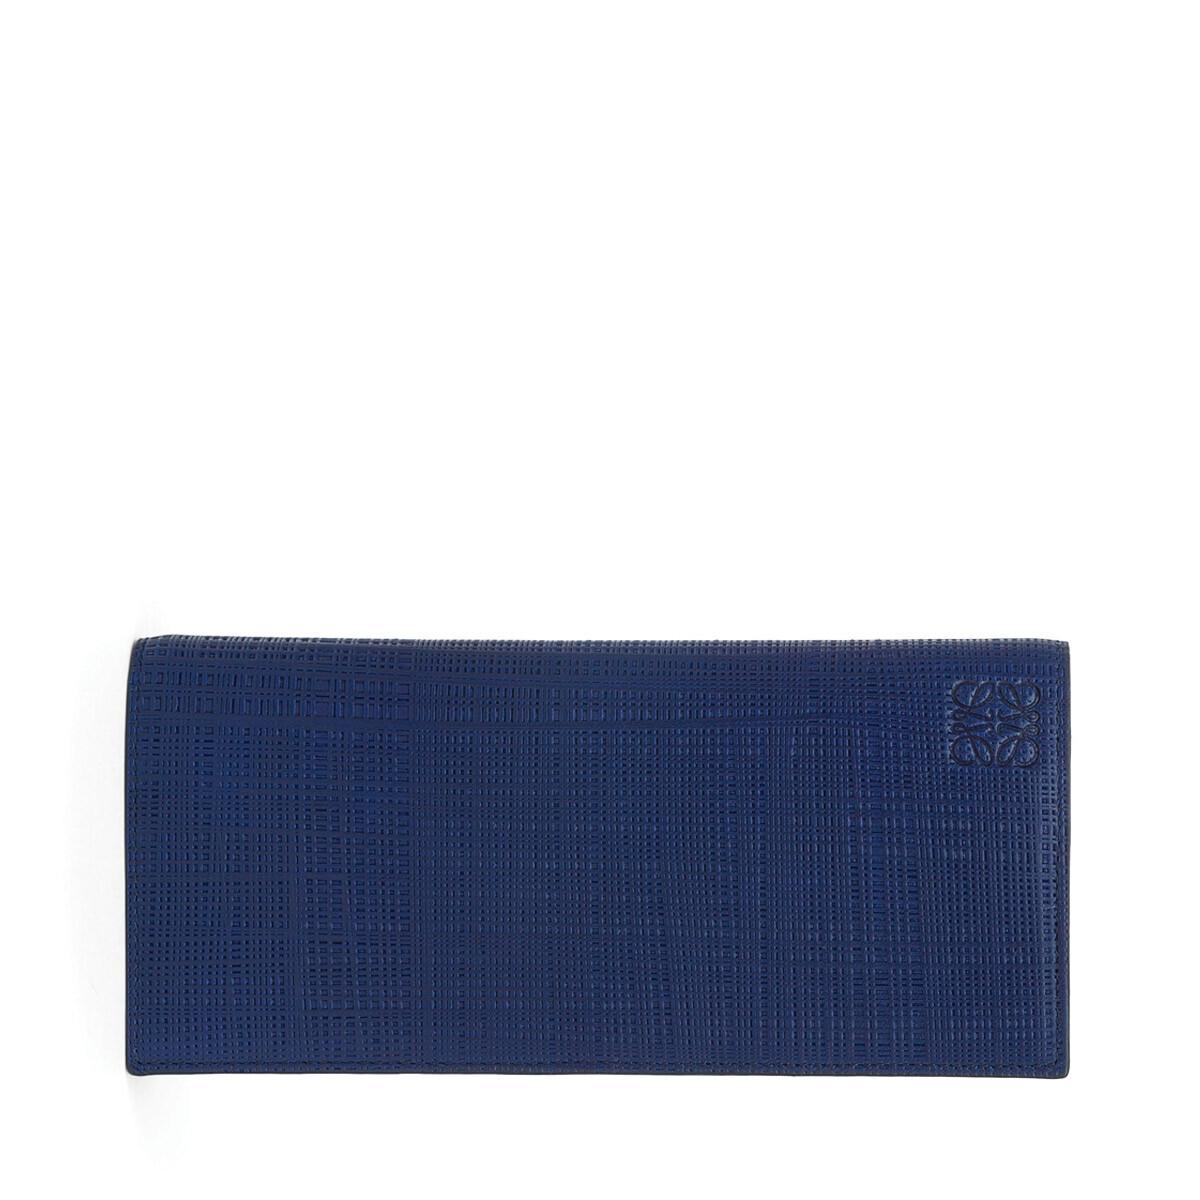 LOEWE Linen Long Horizontal Wallet Navy Blue front